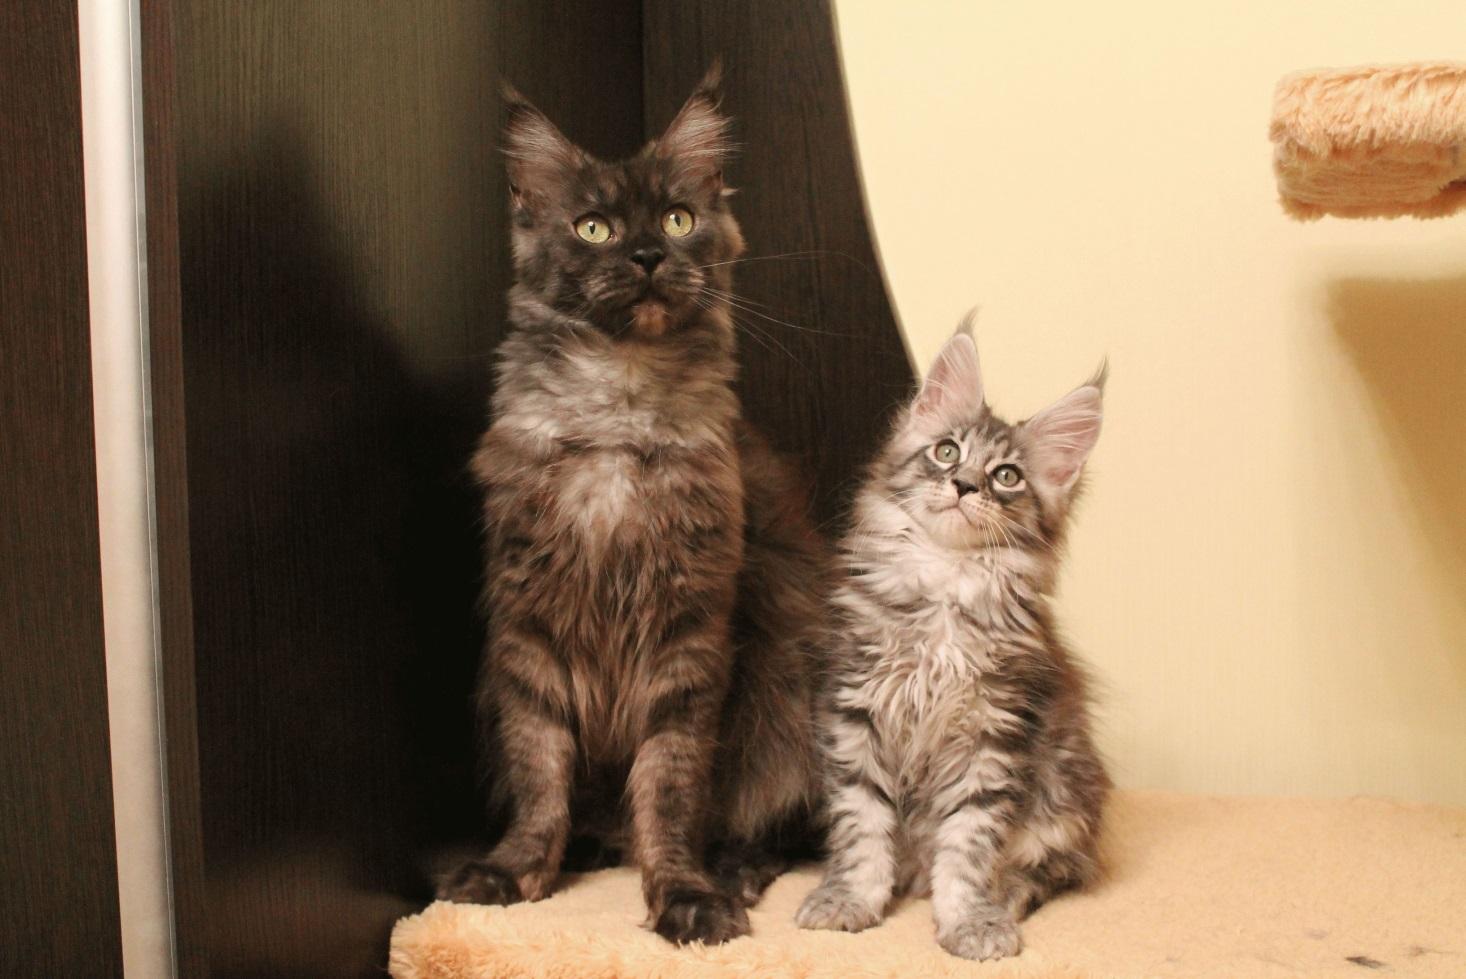 https://murlo.org/ru/wp-content/uploads/2014/09/Кошки-Мейн-кун-фото.jpg